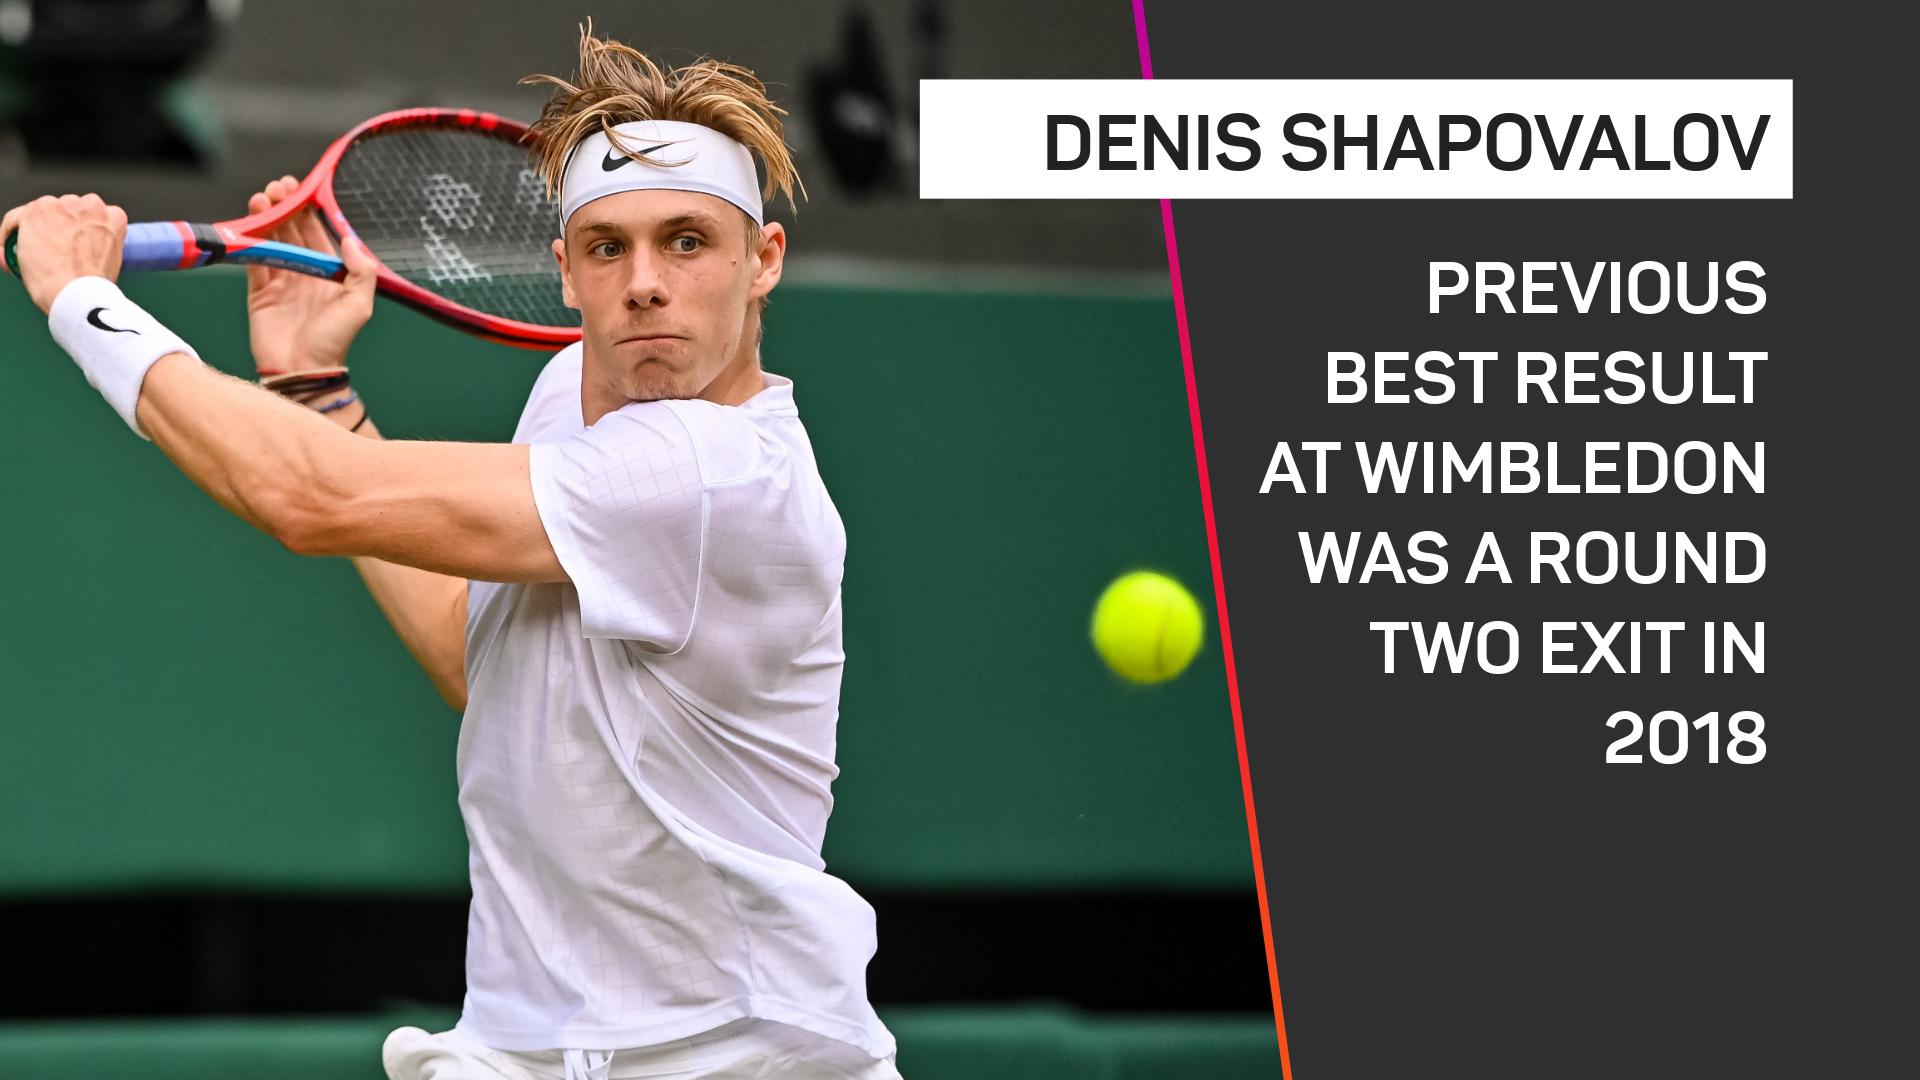 Denis Shapovalov turned his Wimbledon fortunes around